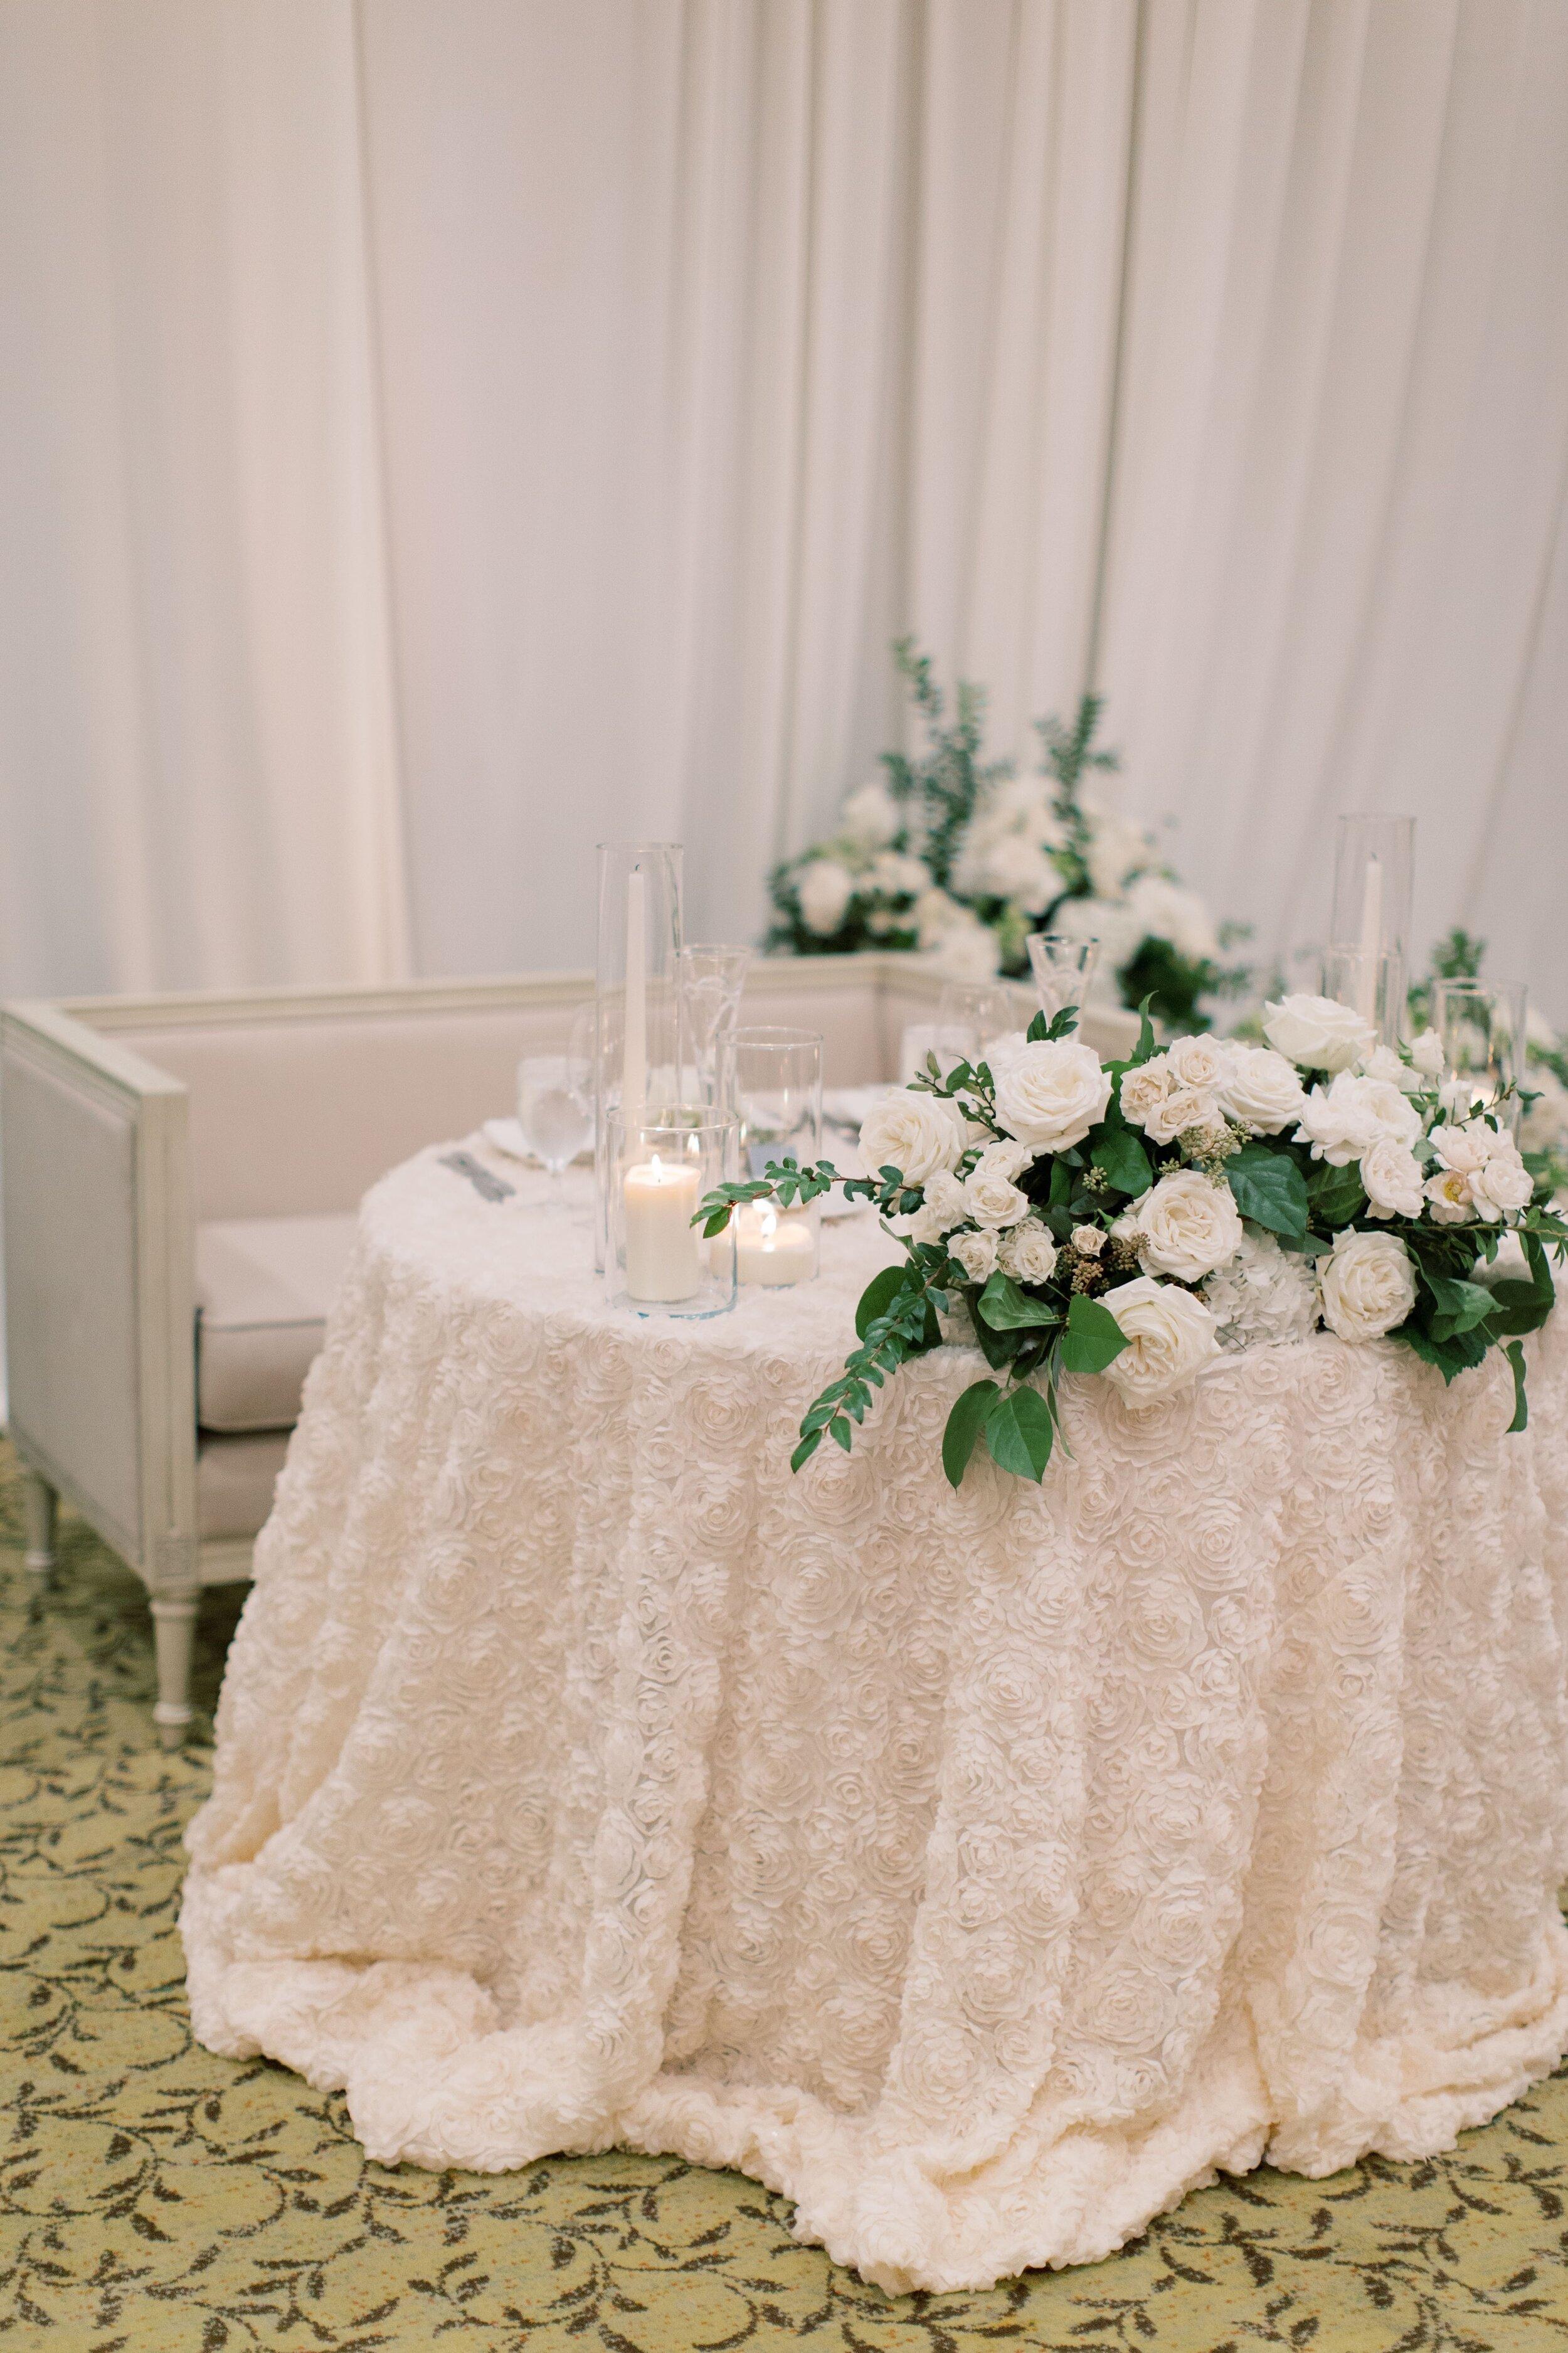 Wheeler_Rancho_Bernardo_Inn_San_Diego_California_Wedding_Devon_Donnahoo_Photography_0901.jpg.jpeg